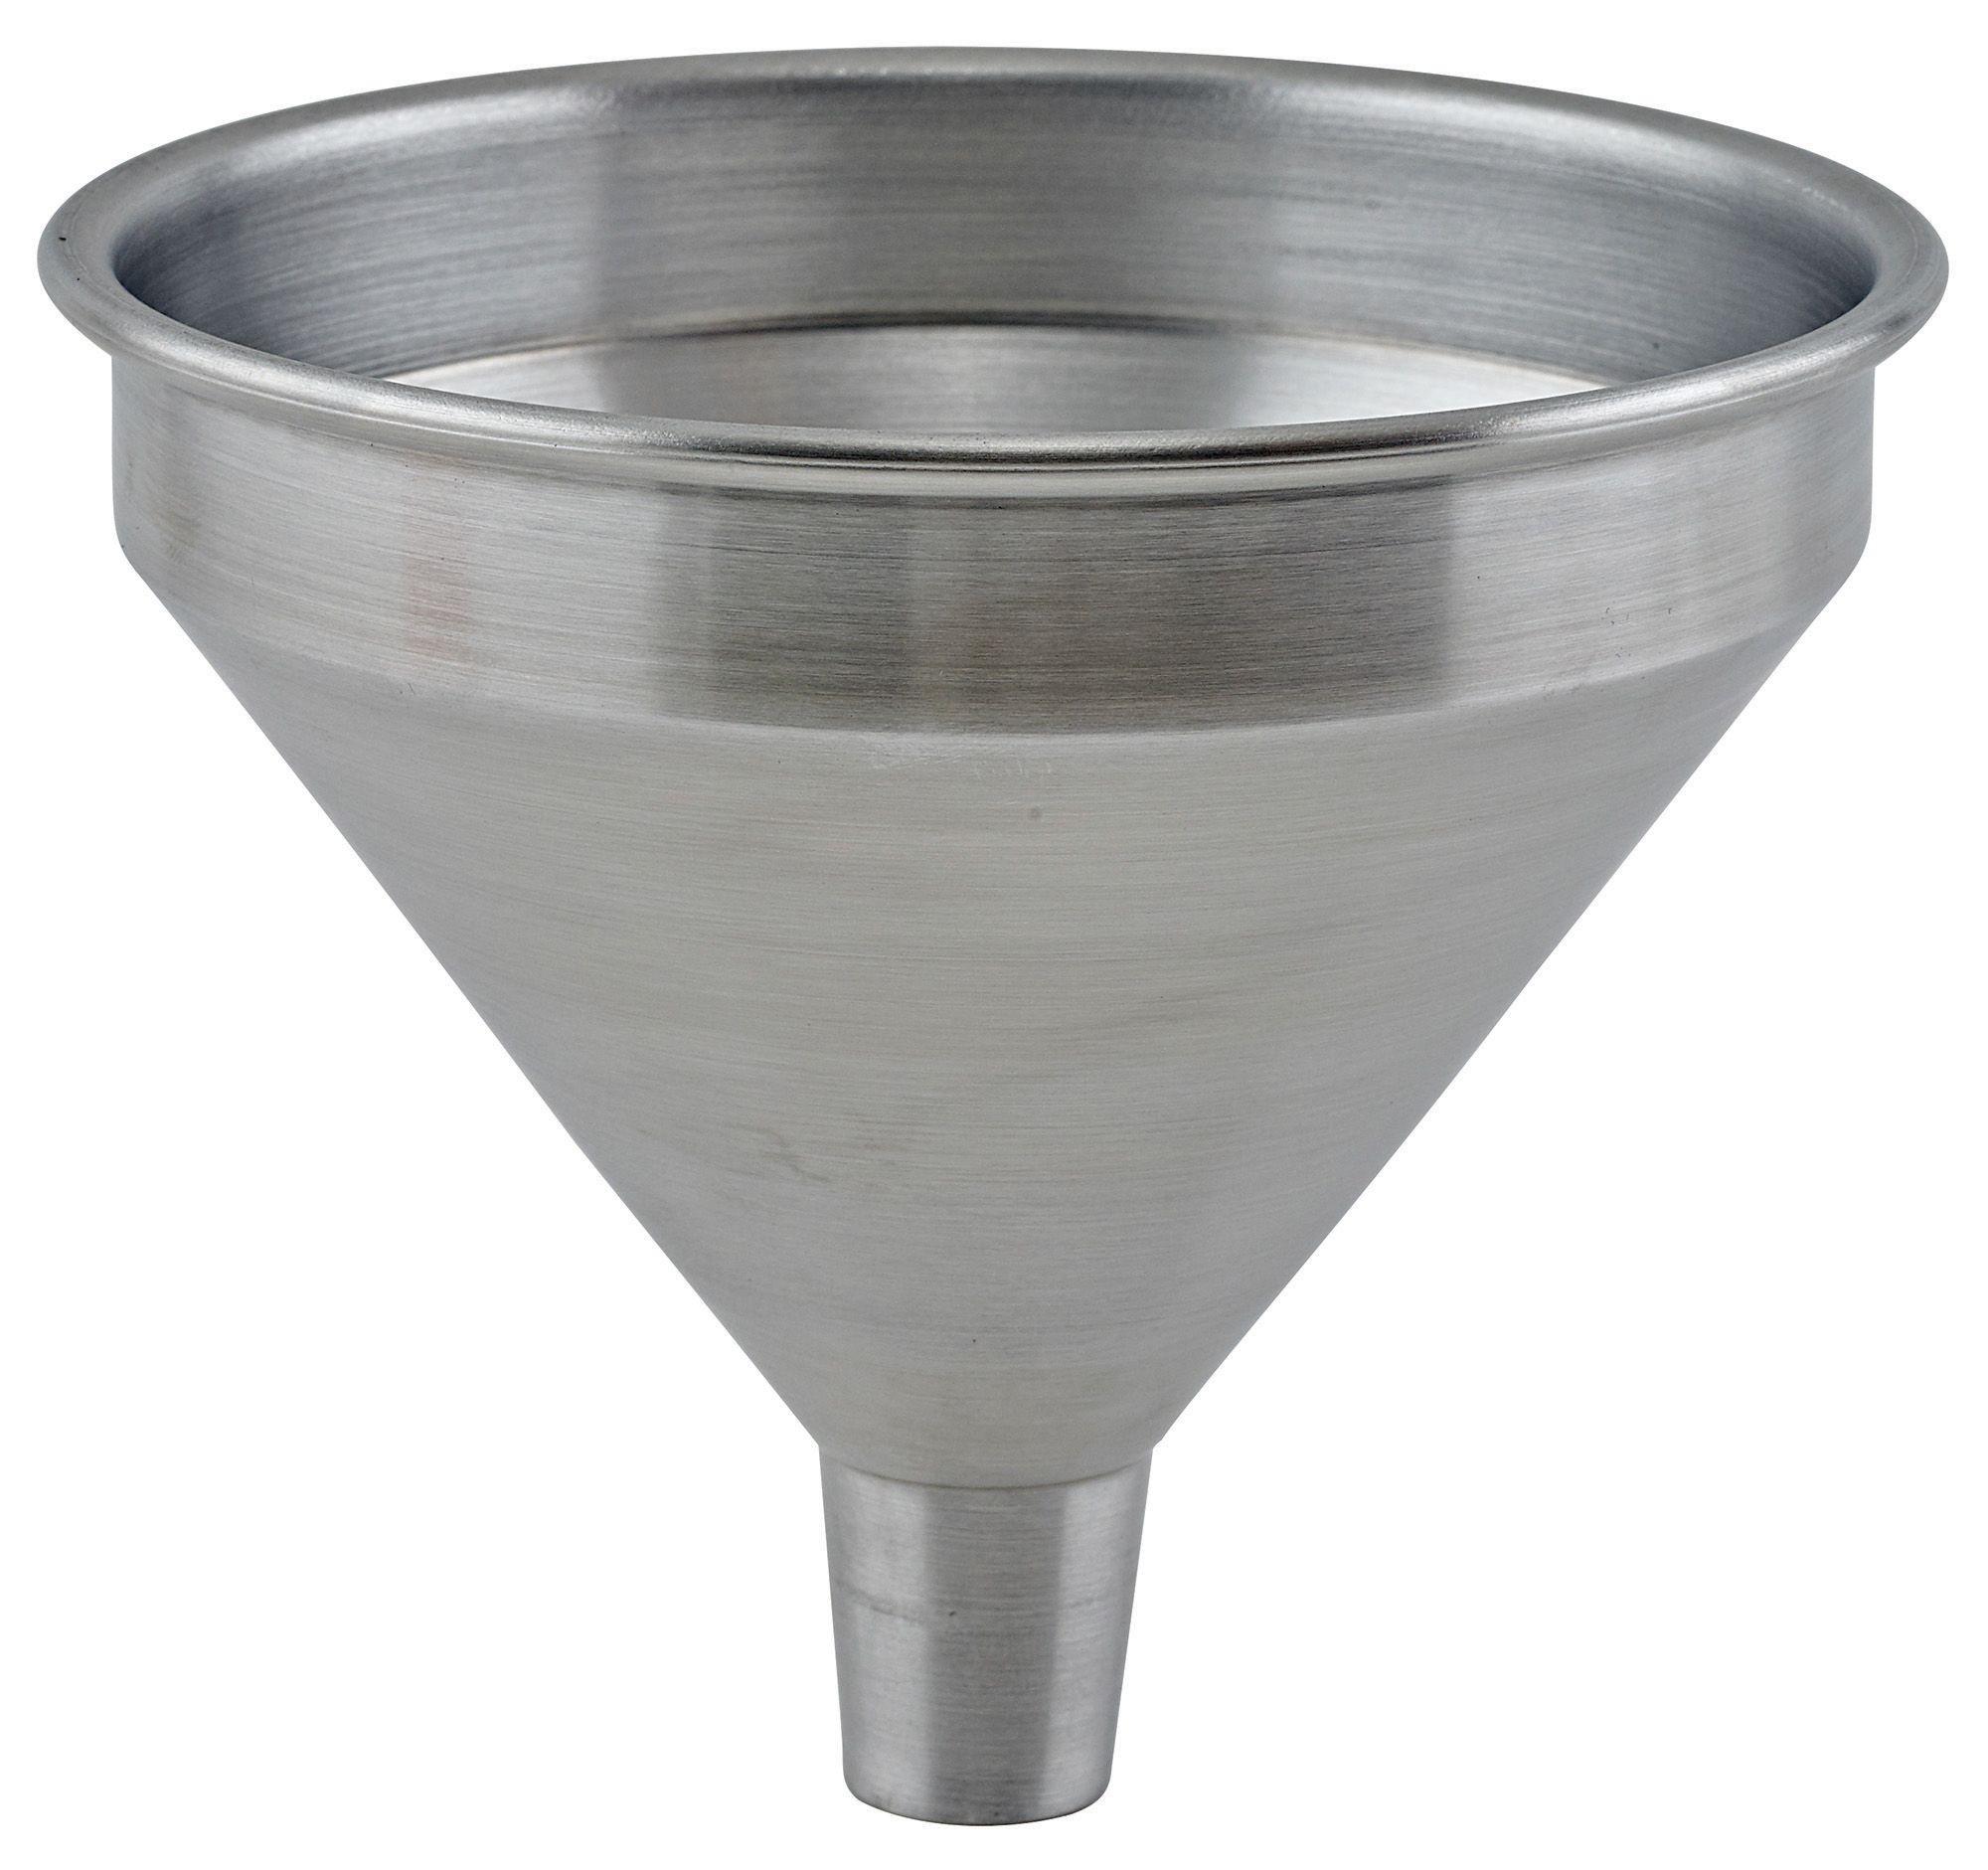 "Winco SAF-05 1/2 Pint Spun Aluminum Funnel, 3-7/8"" Dia. x 3-5/8""H"